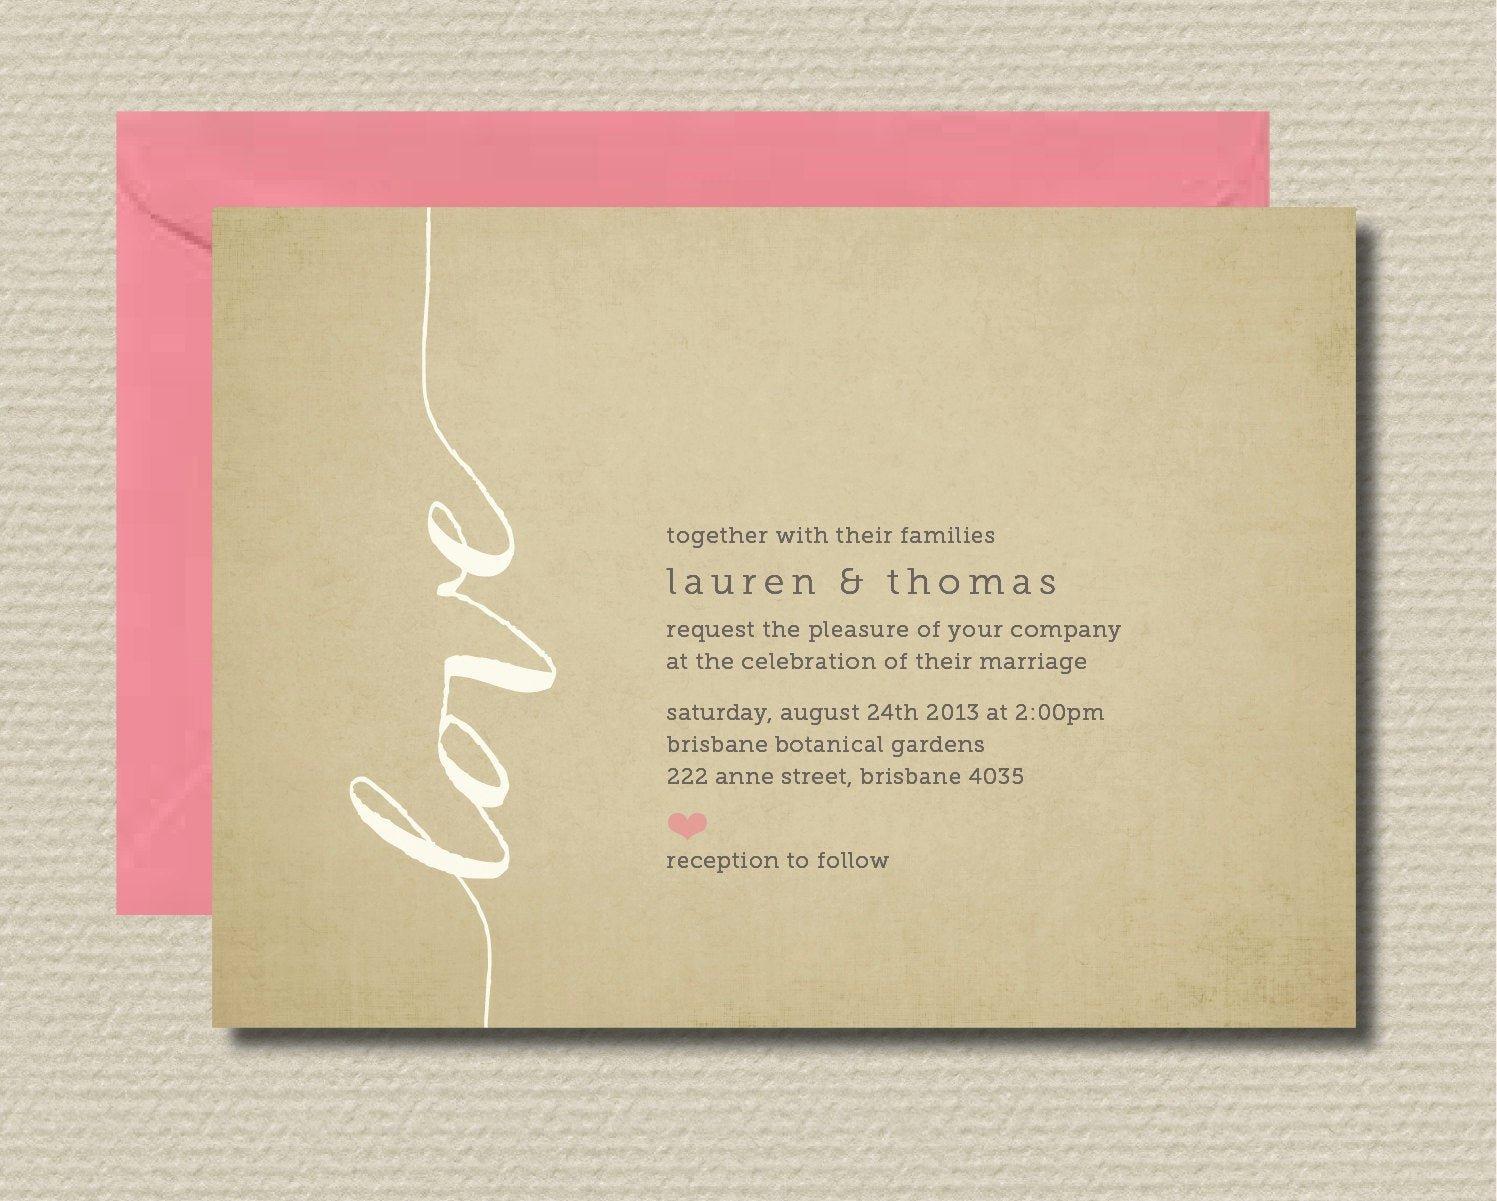 Rsvp Online Wording New Printable Wedding Invitation & Rsvp Love by Rosiedaydesign